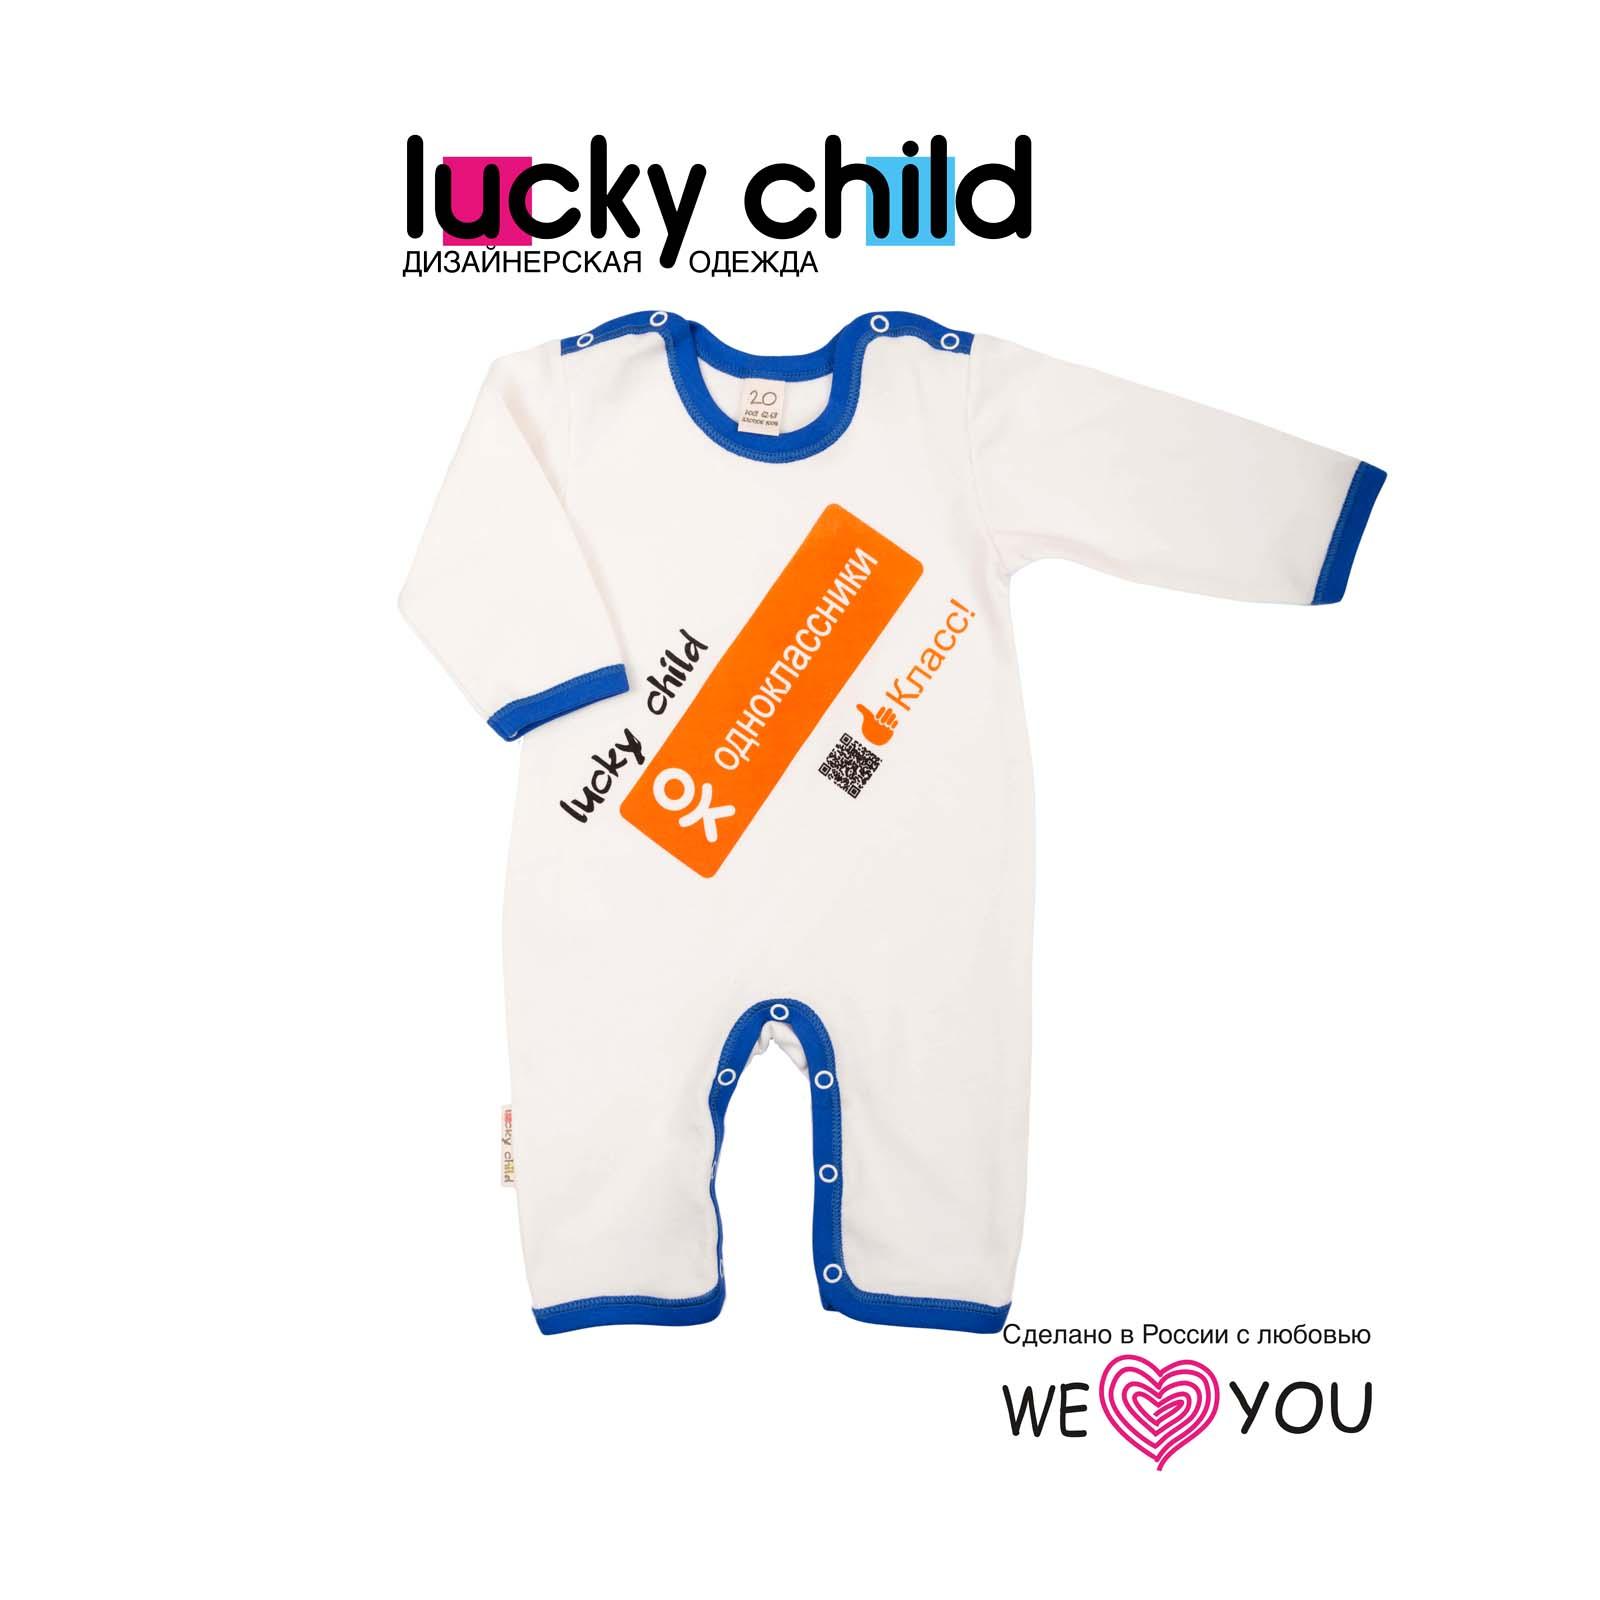 Комбинезон Lucky Child с надписью Одноклассники размер 74<br>